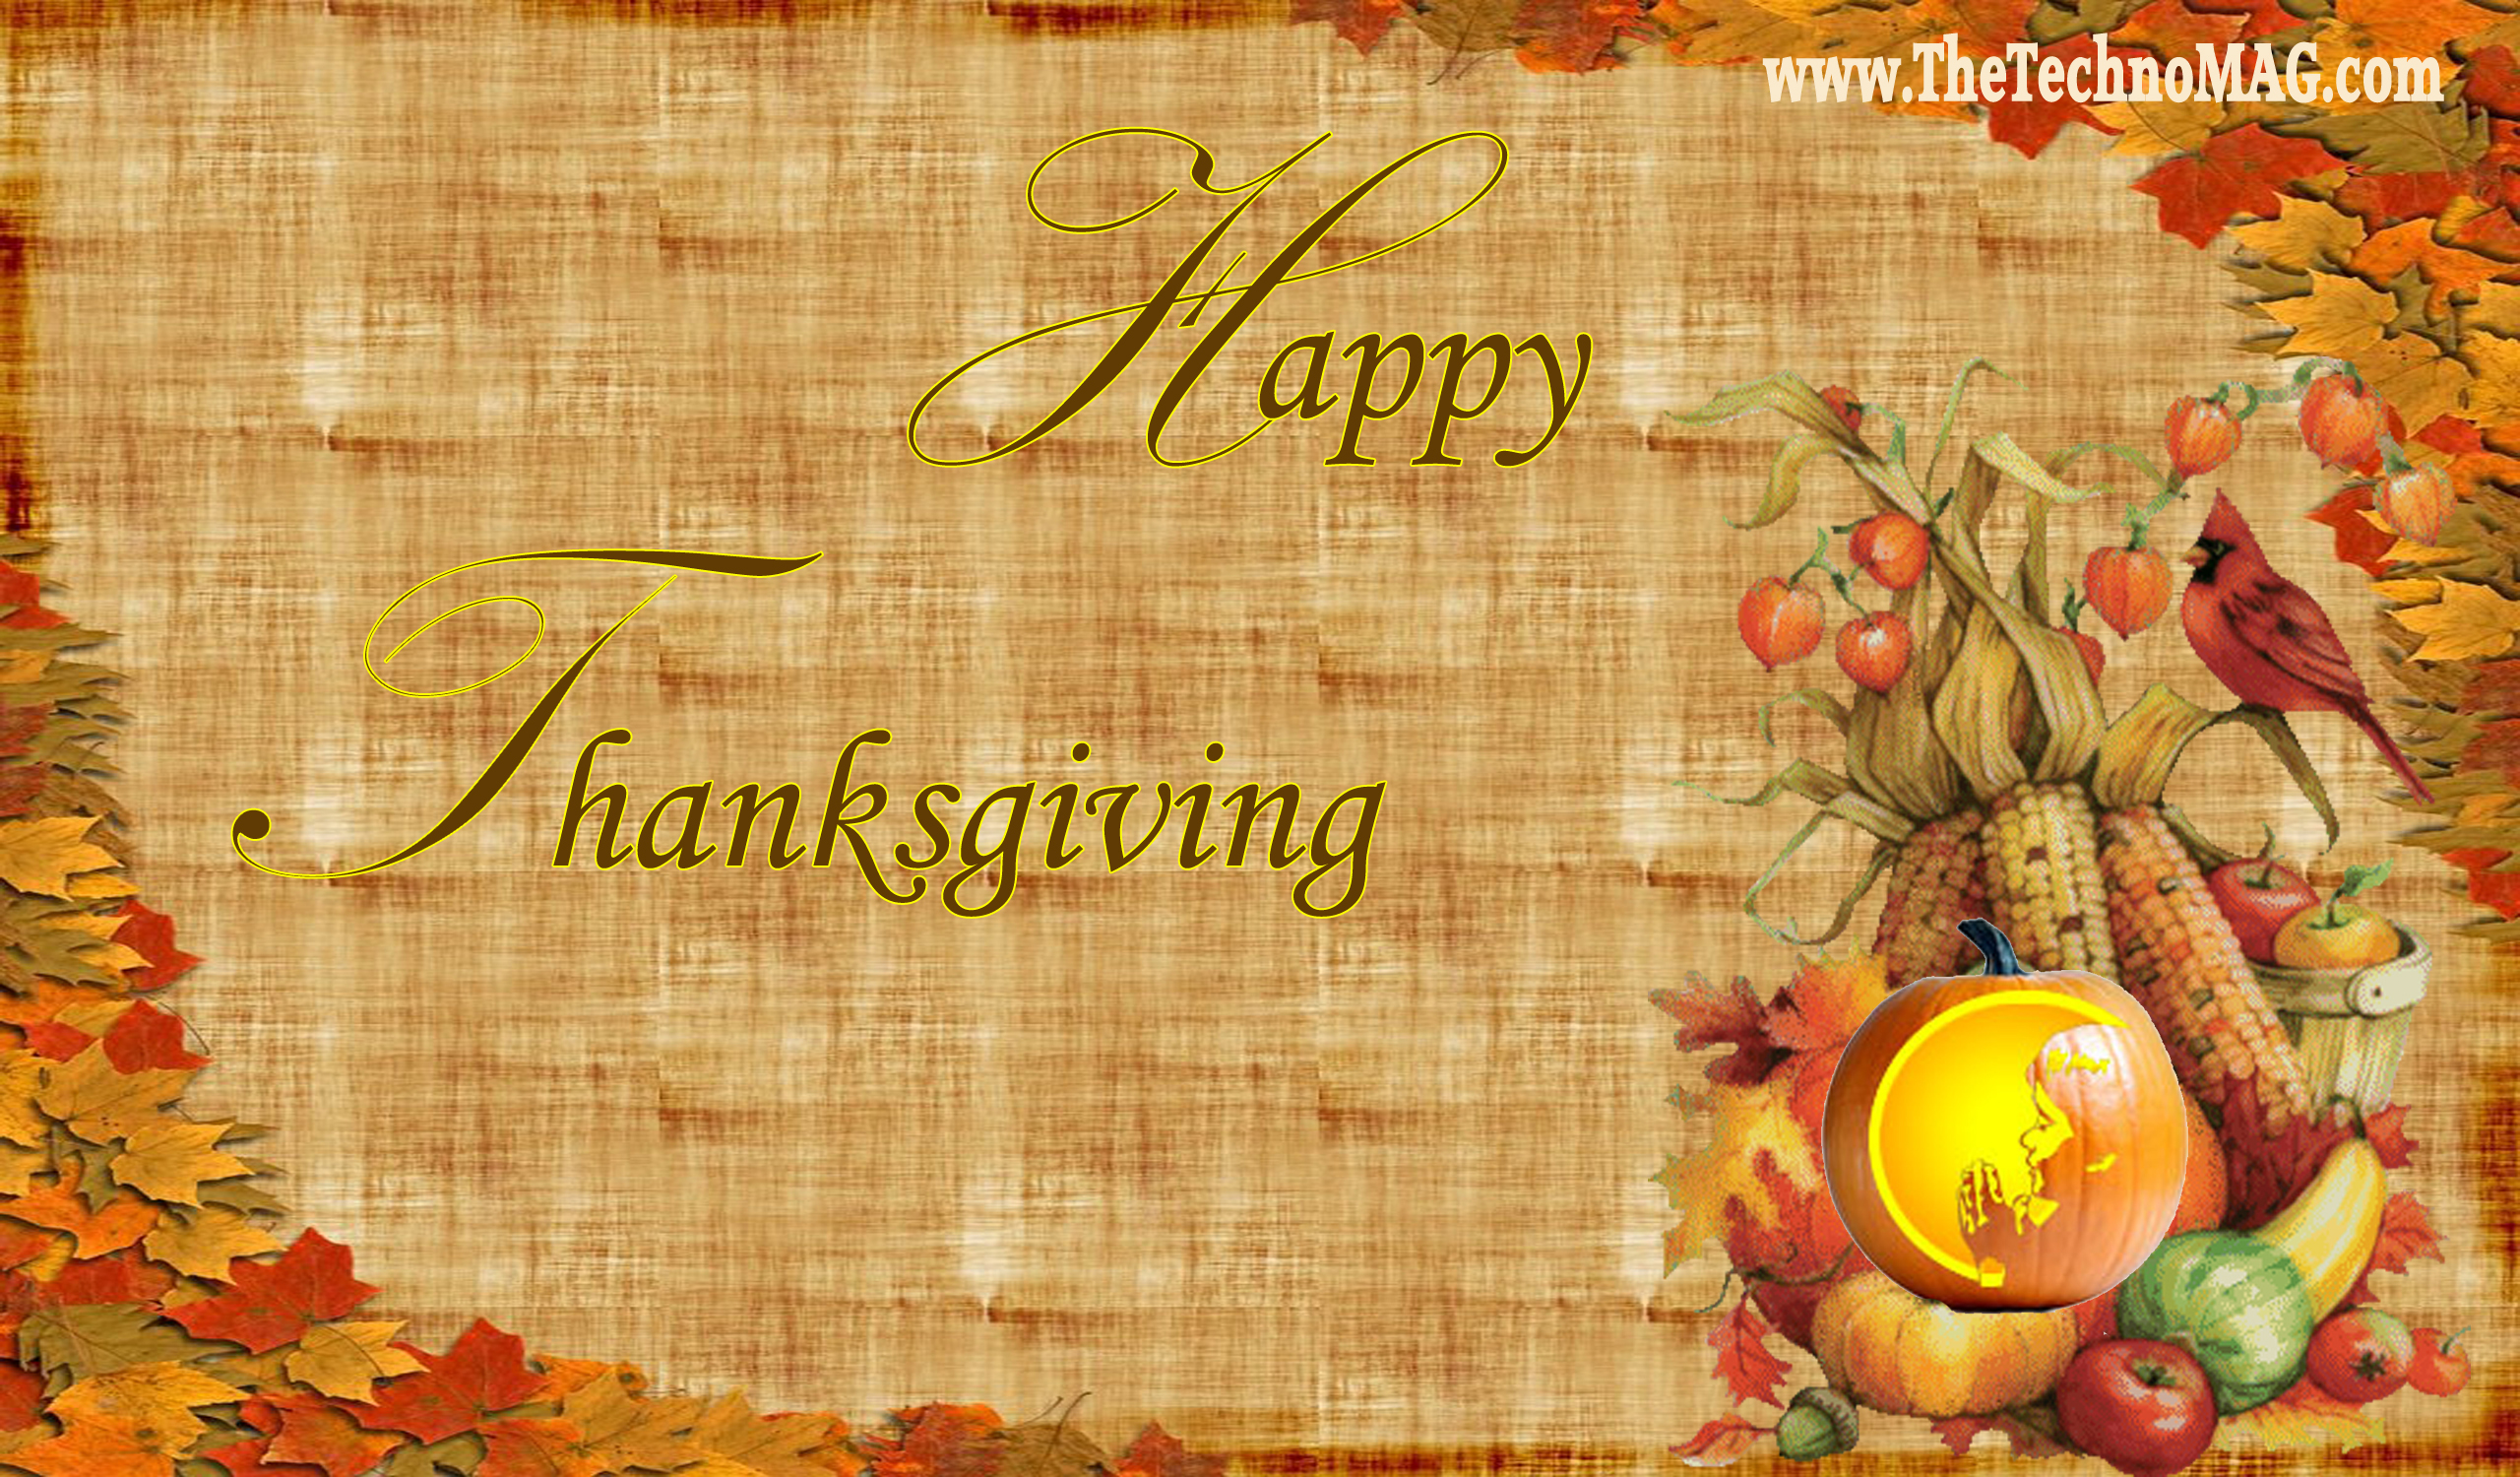 thanksgiving wallpapers splendid